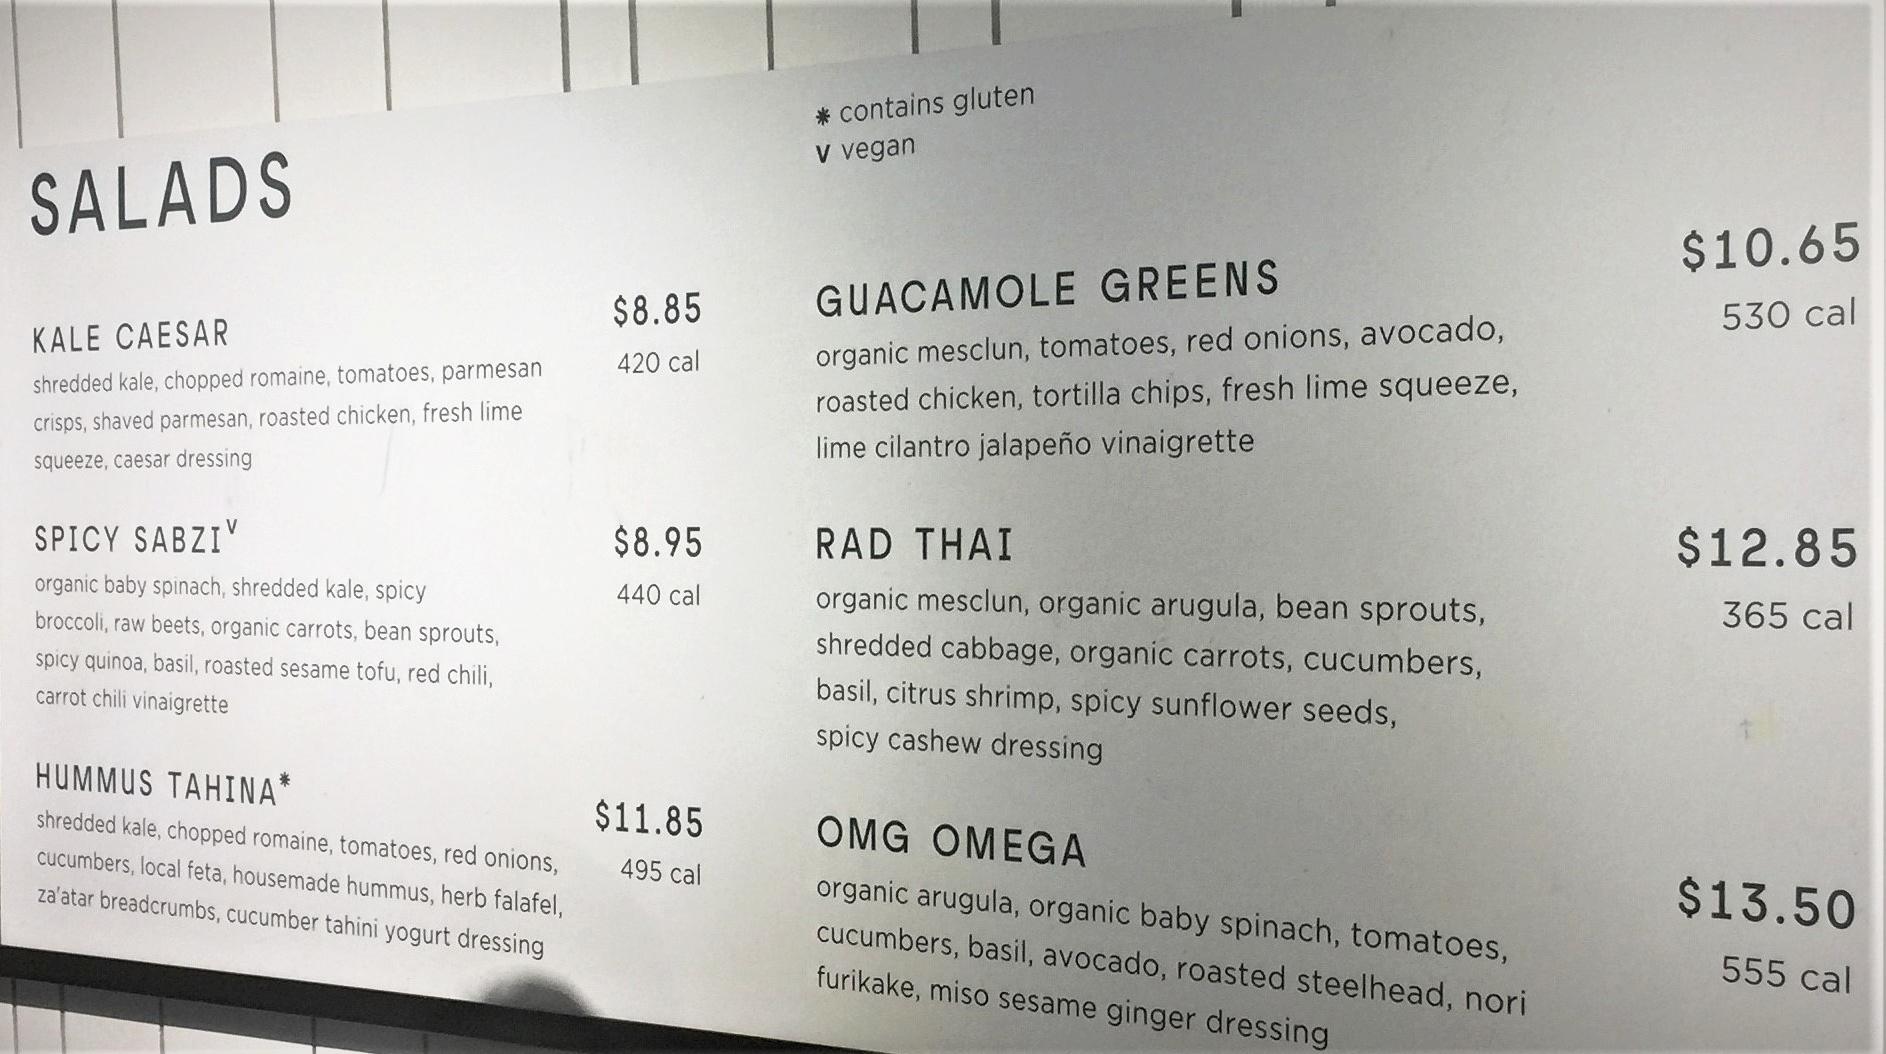 Wall menu in Sweetgreen's, Brooklyn, NY, May 2017